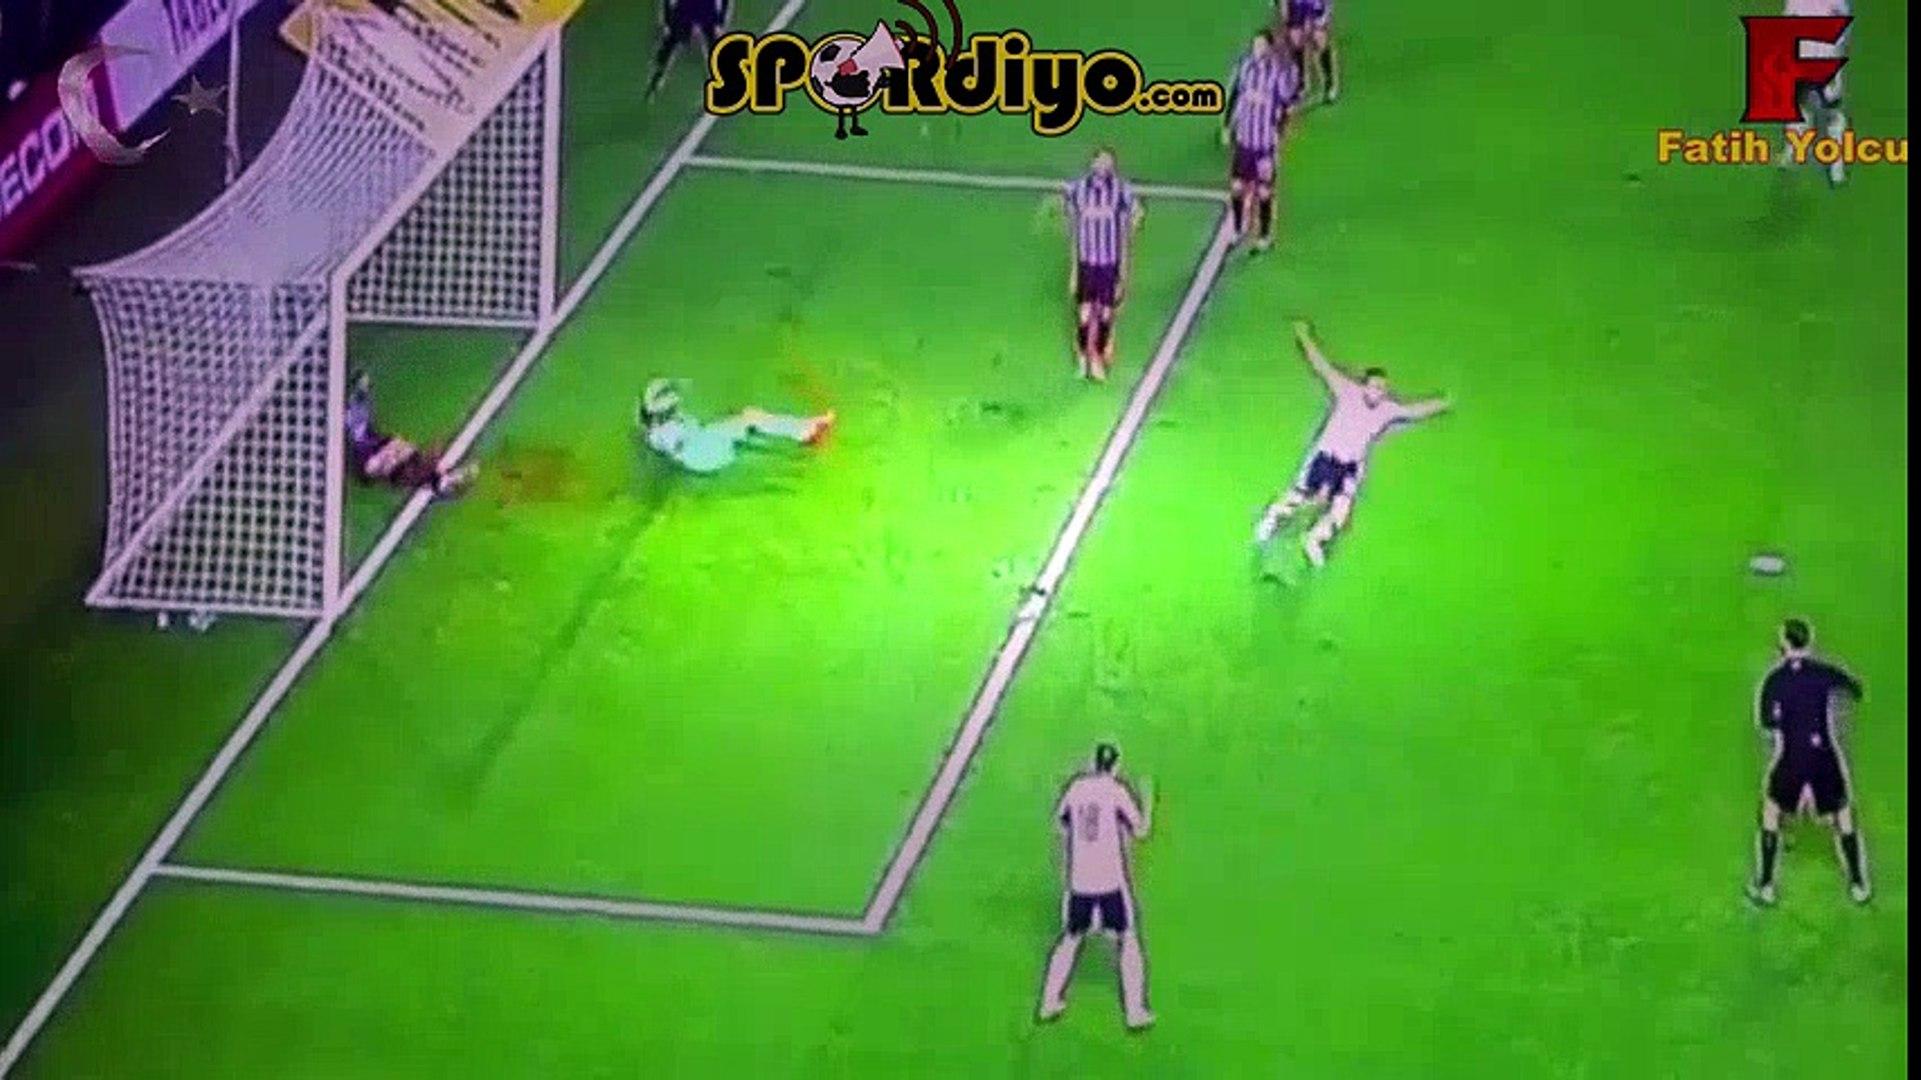 Futbol Komik Goller www.spordiyo.com